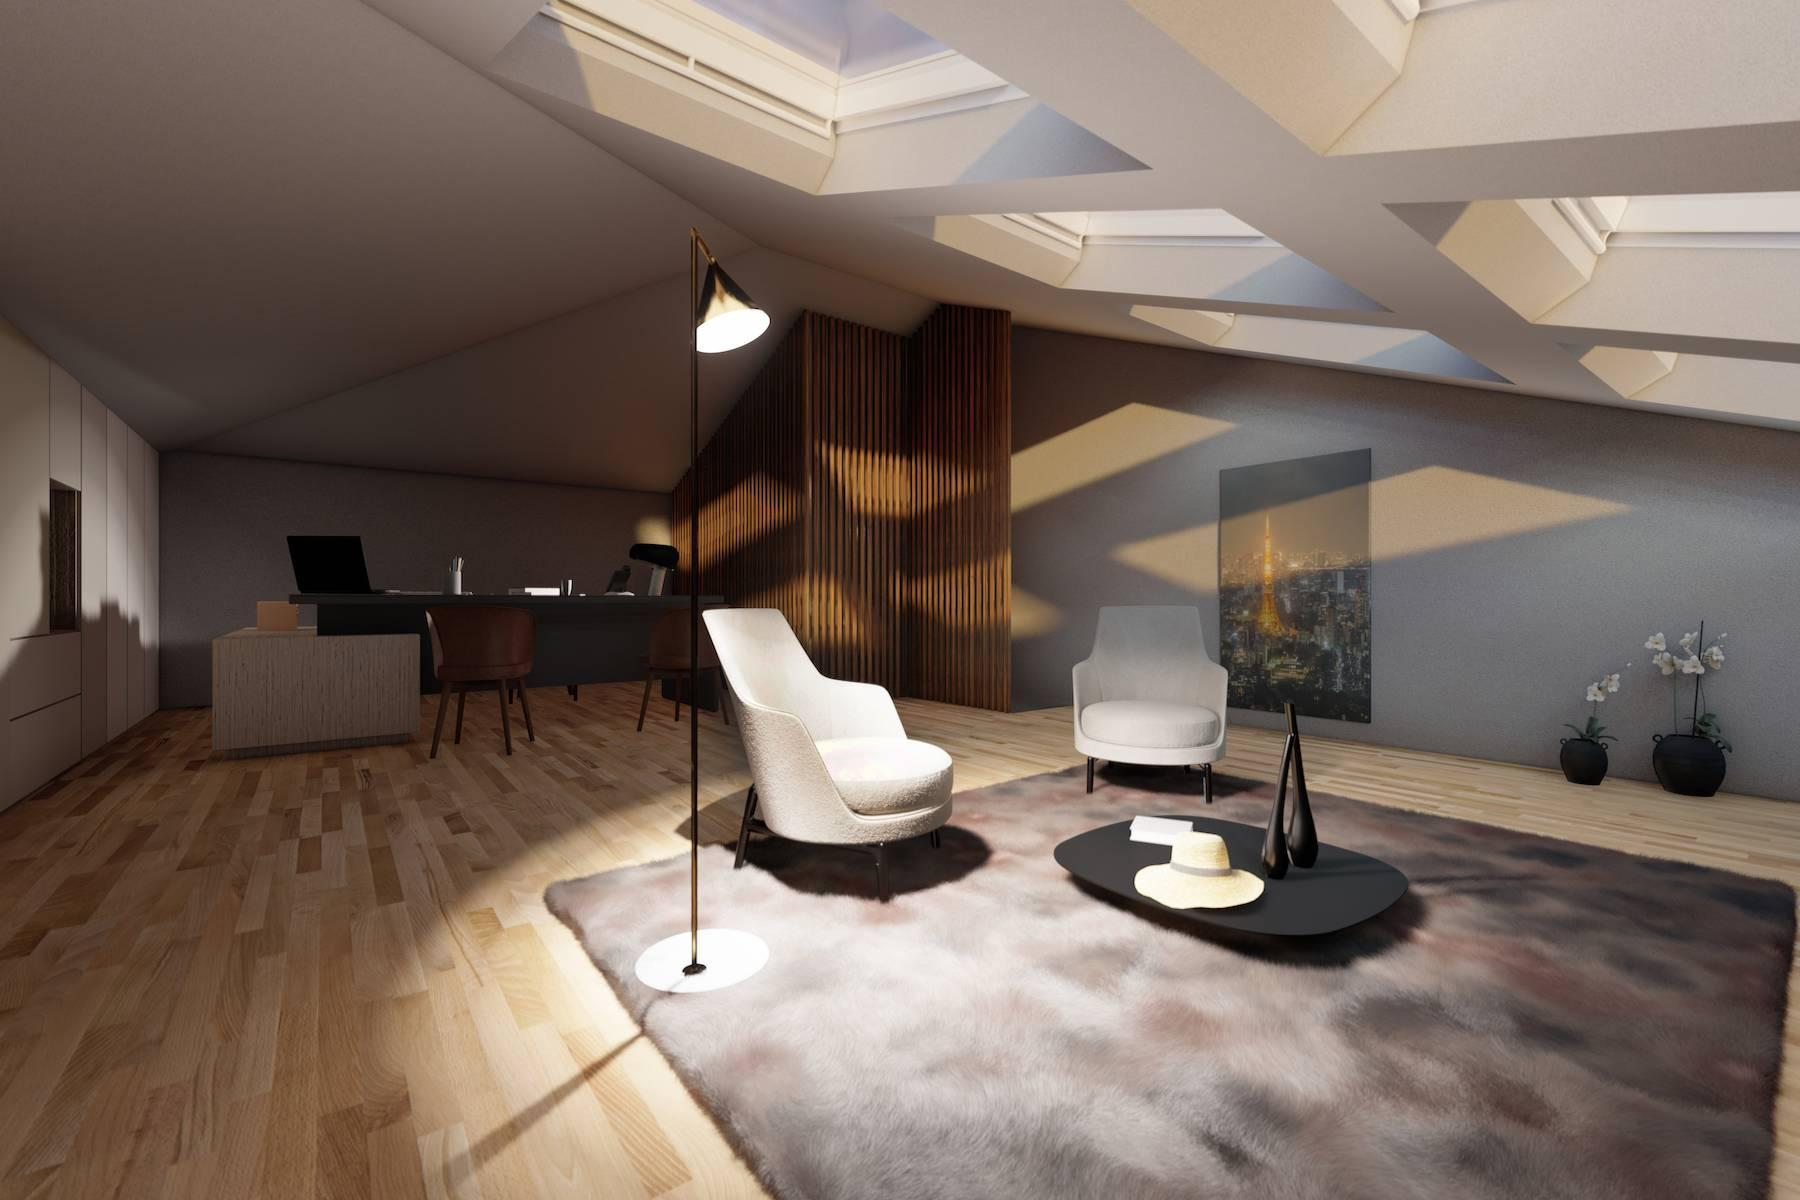 Luxus-Wohnungen am Meer in Viareggio - 10